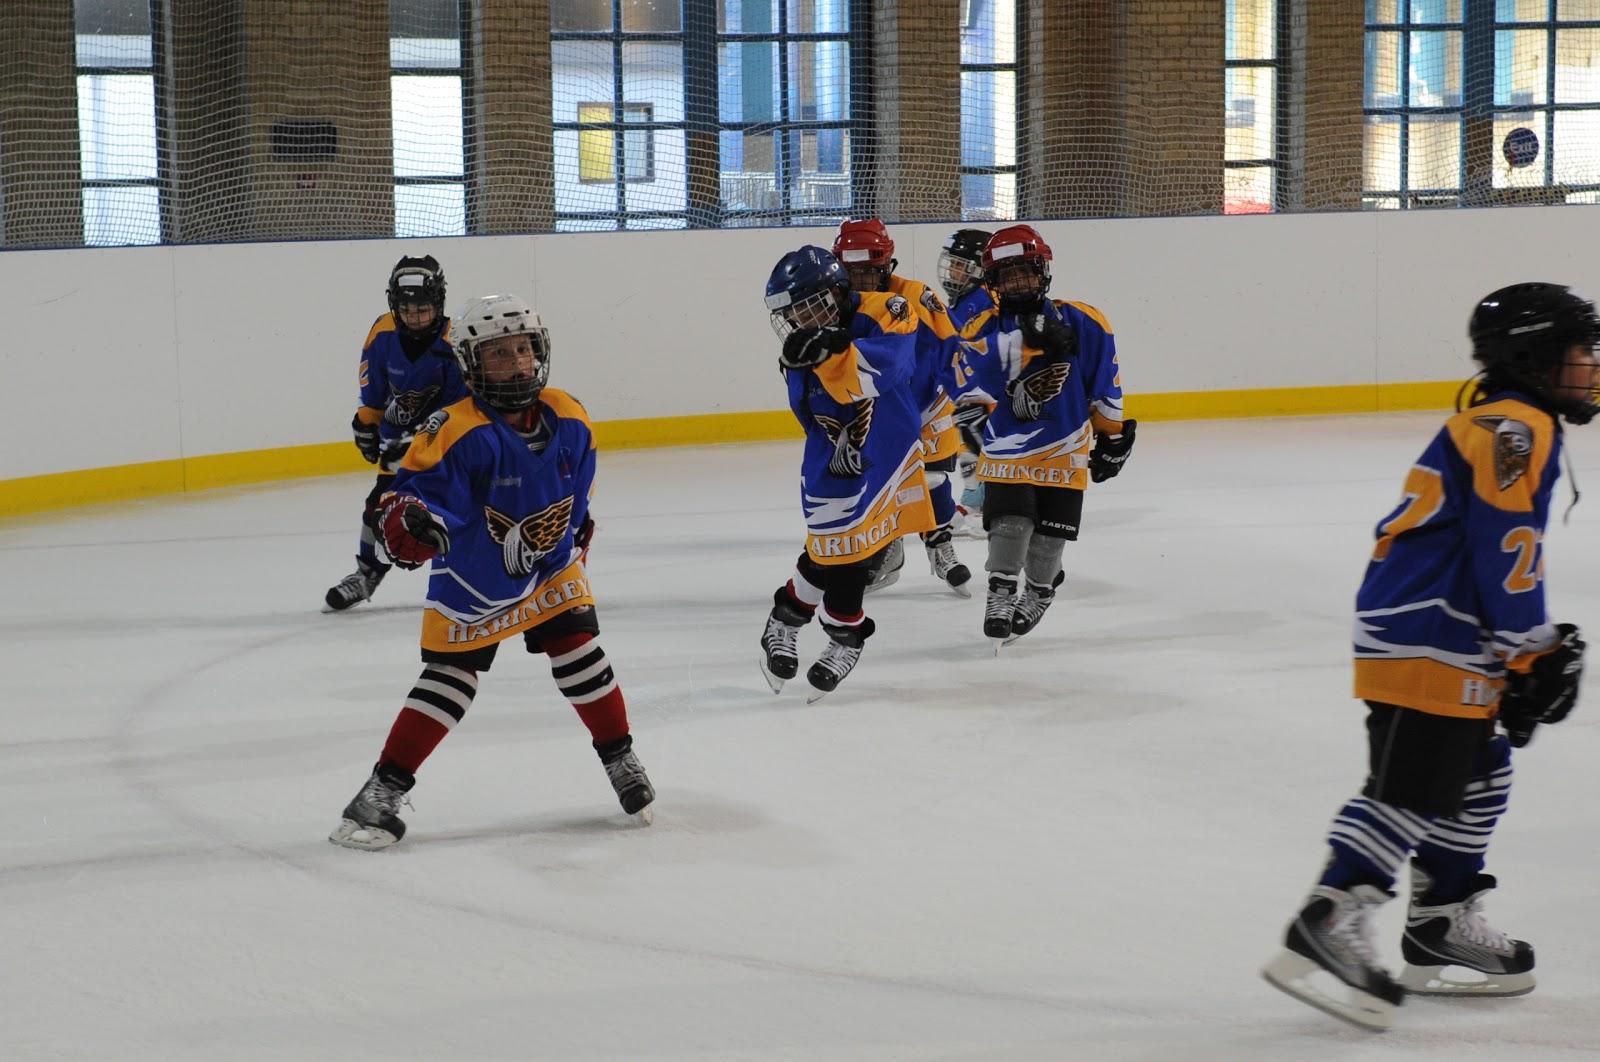 Guildford ice hockey |betfair sports rules Flames Ice Hockey